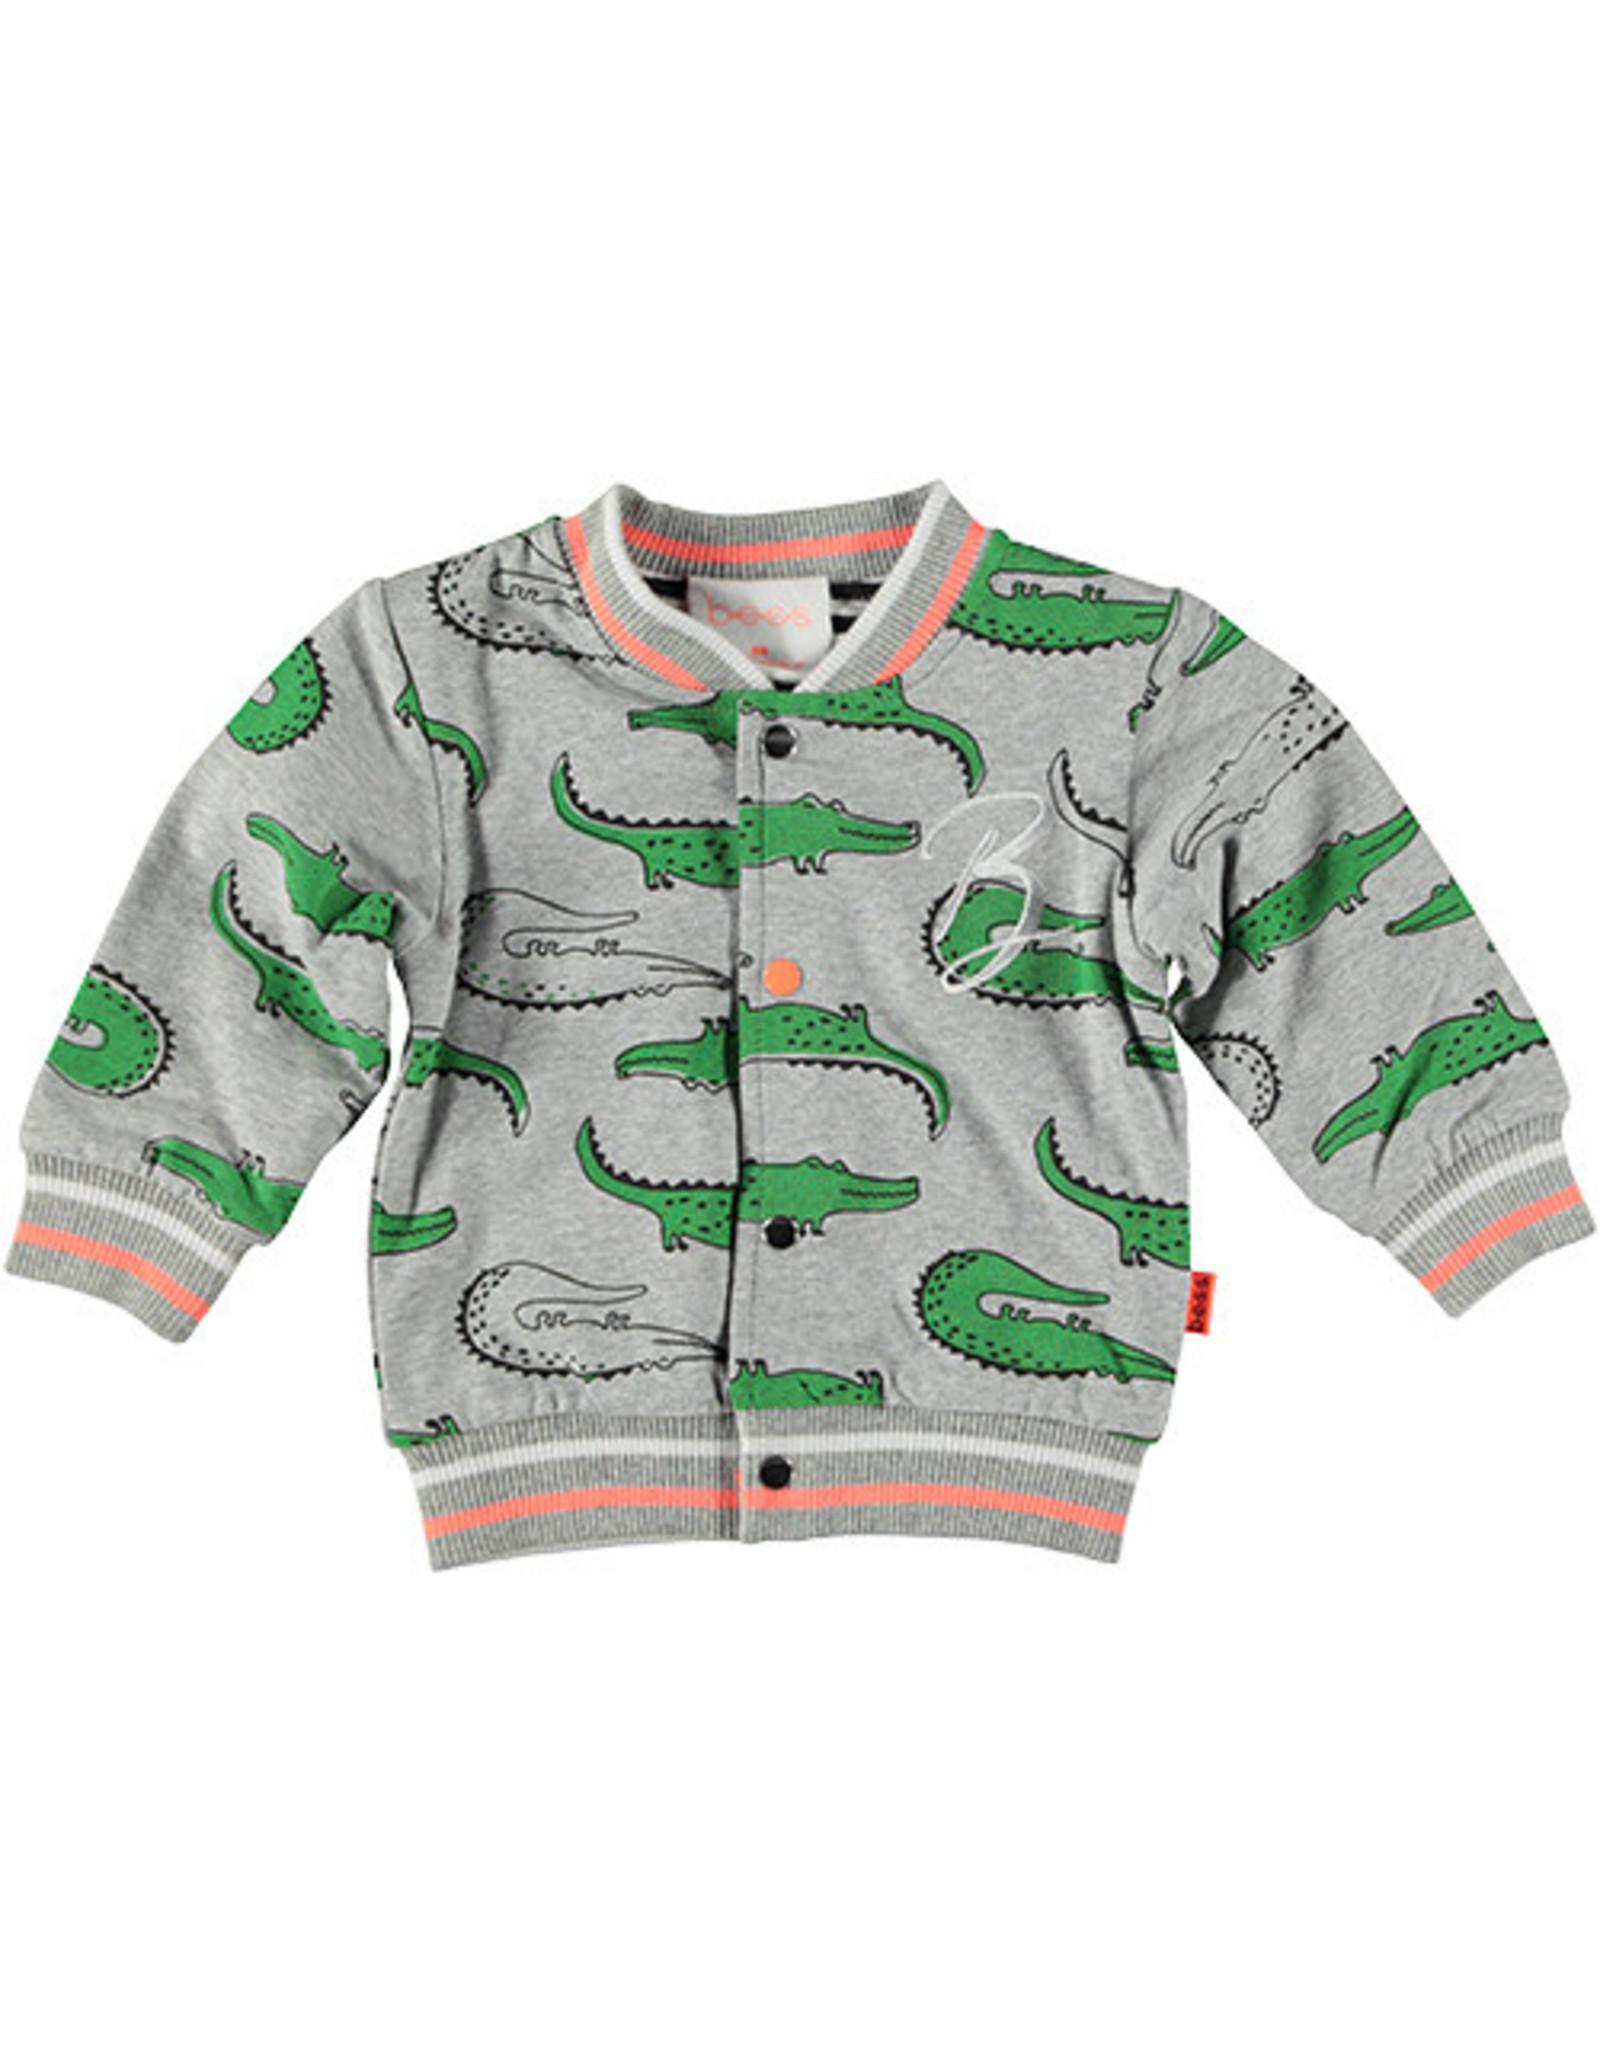 BESS Cardigan Reversible Crocs/Striped 002 Grey